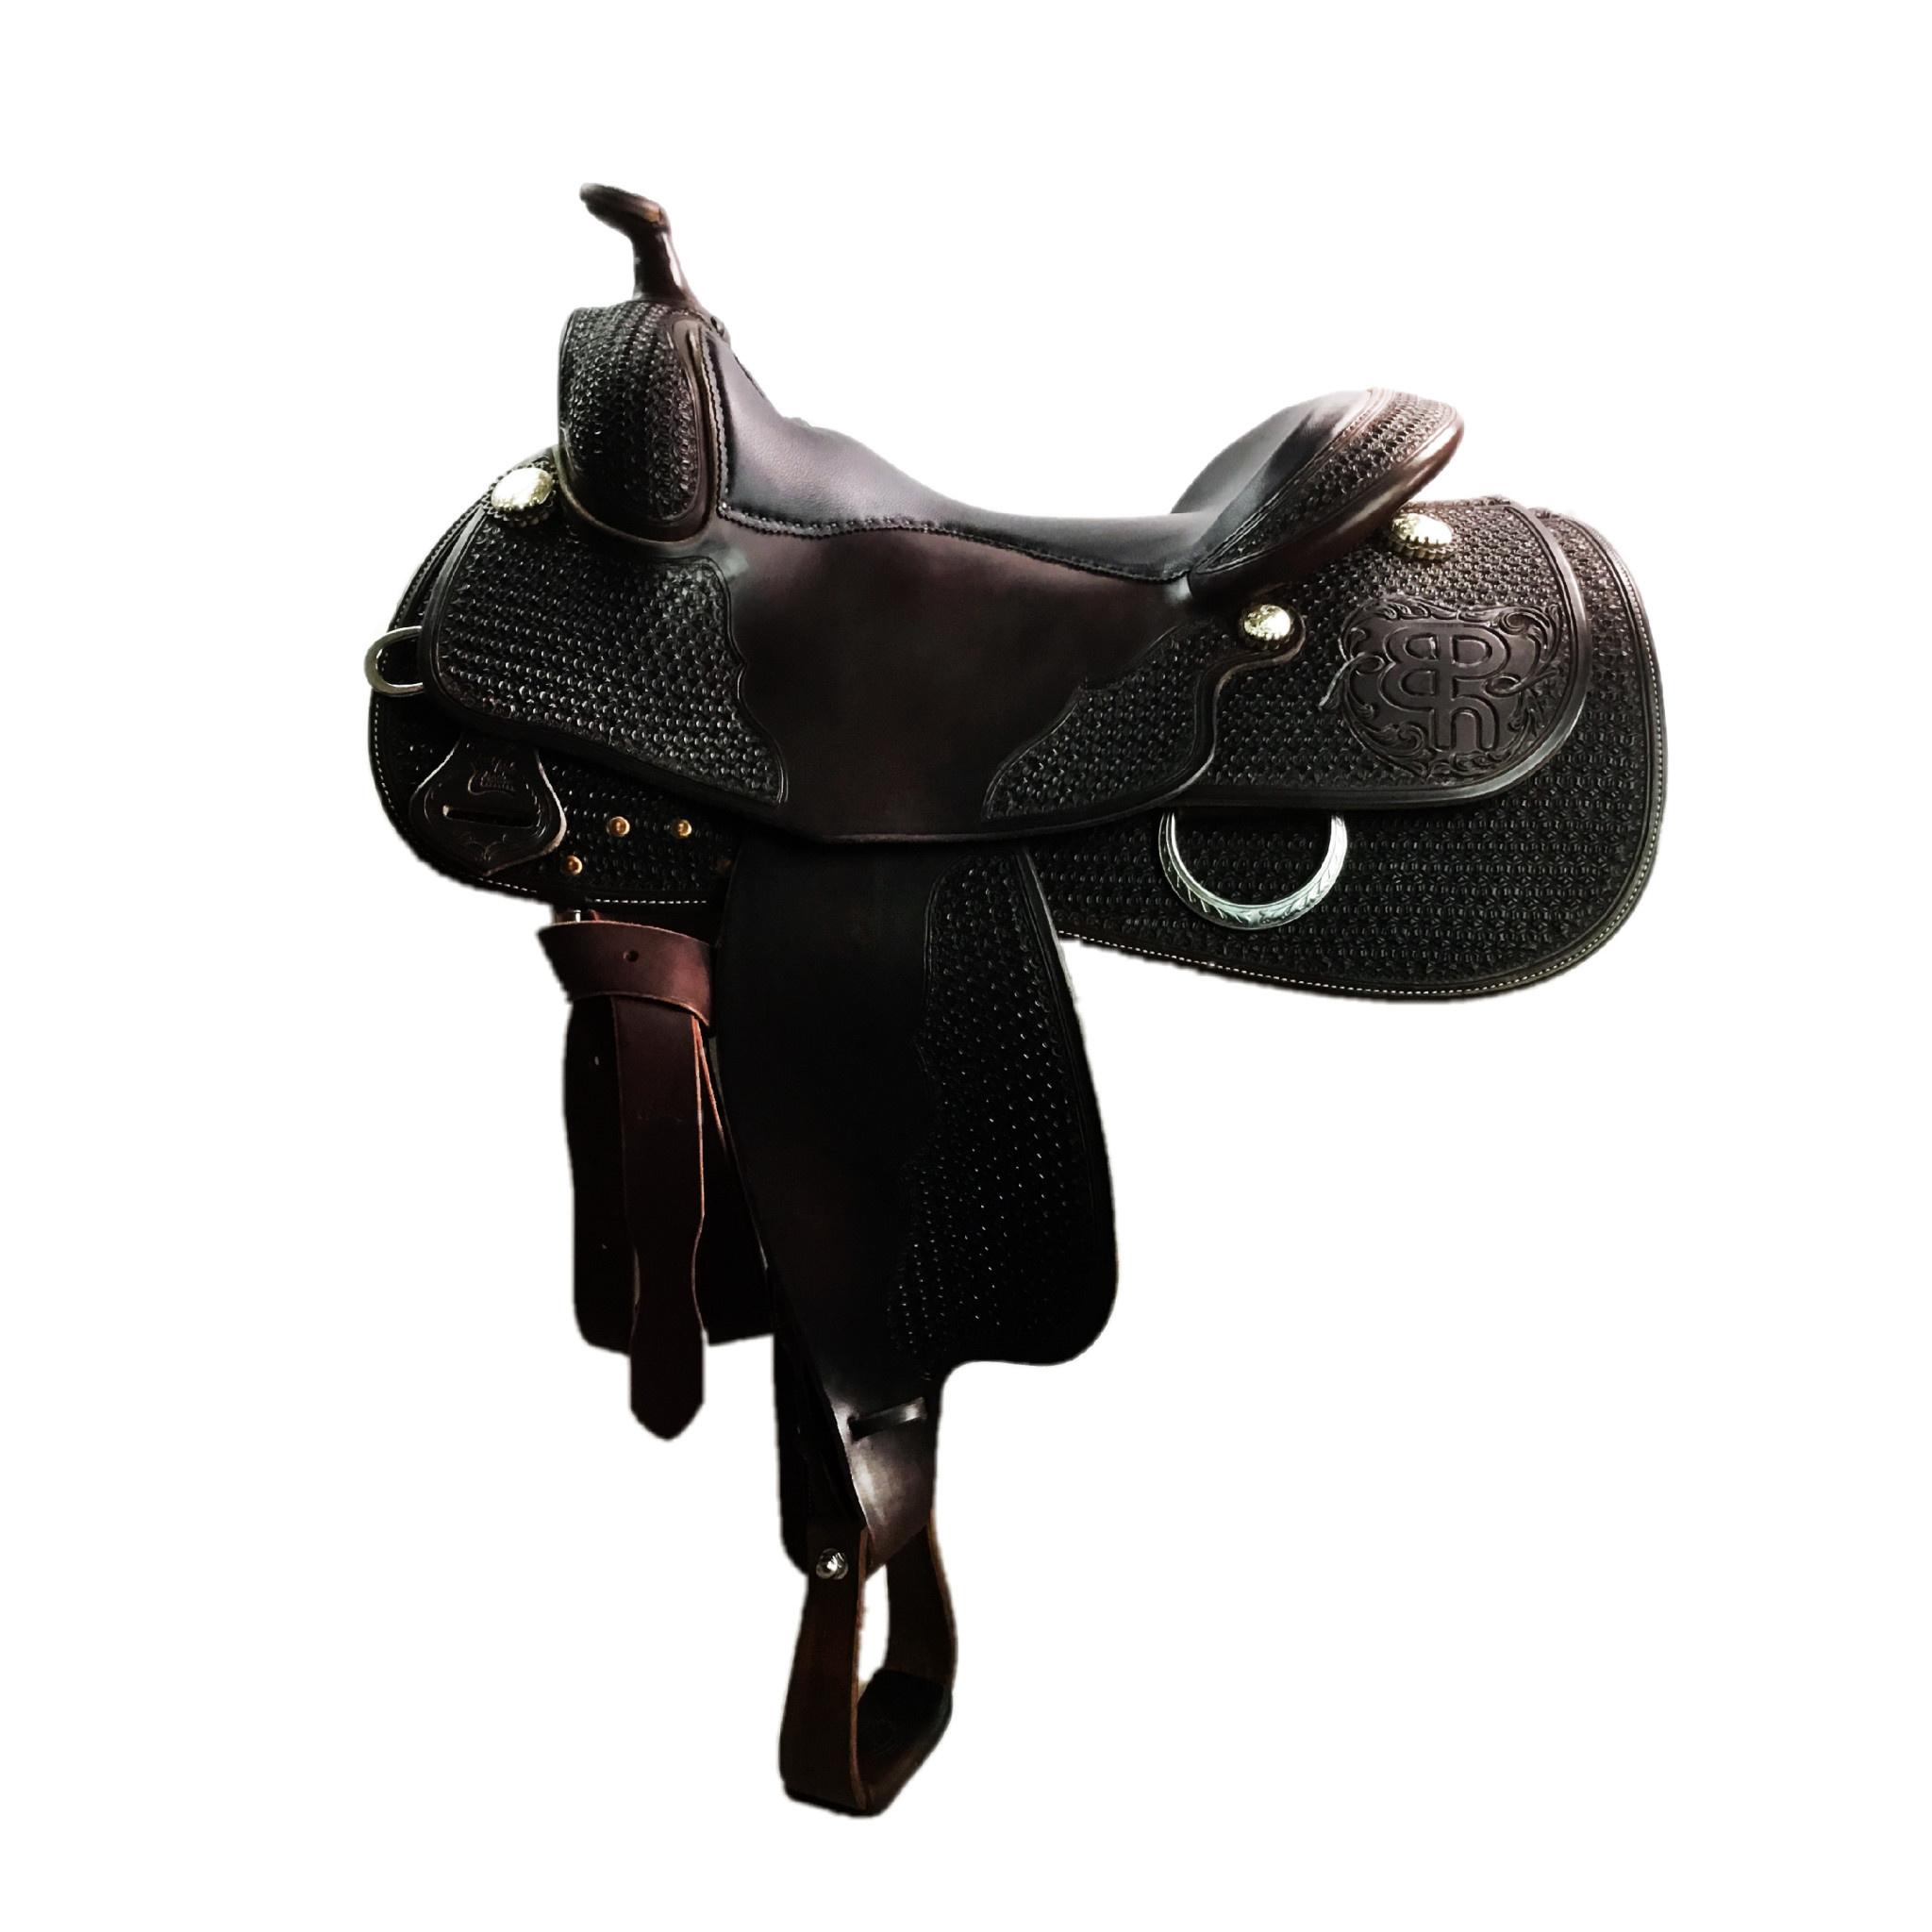 Triple Crown Triple Crown example saddle Don Boyd